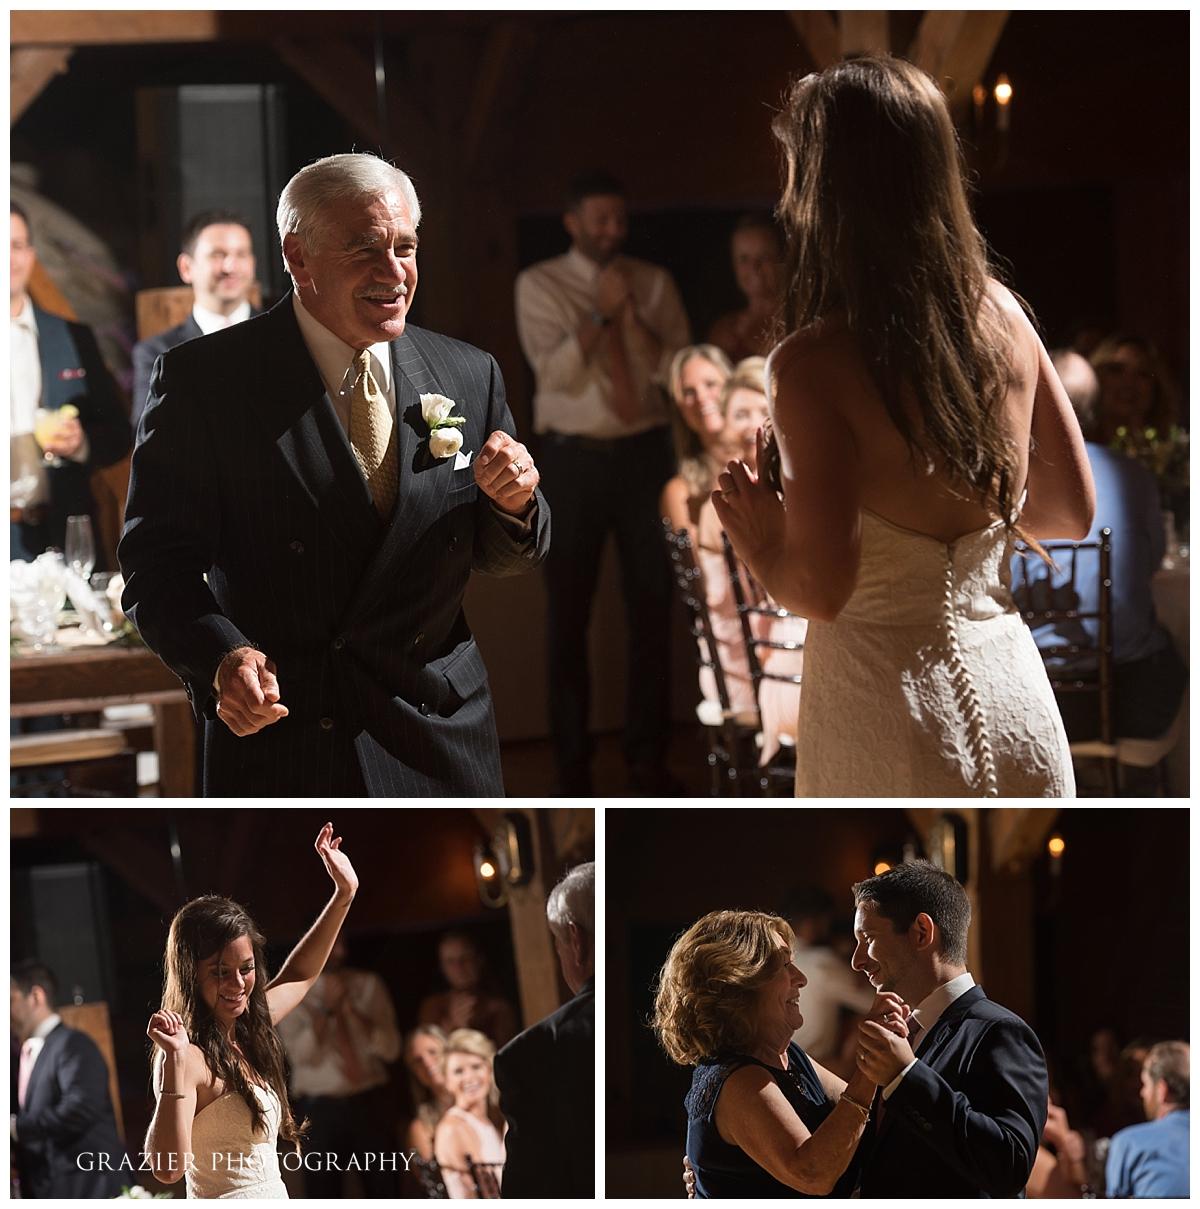 The Red Lion Inn Wedding Grazier Photography 170826-98_WEB.jpg